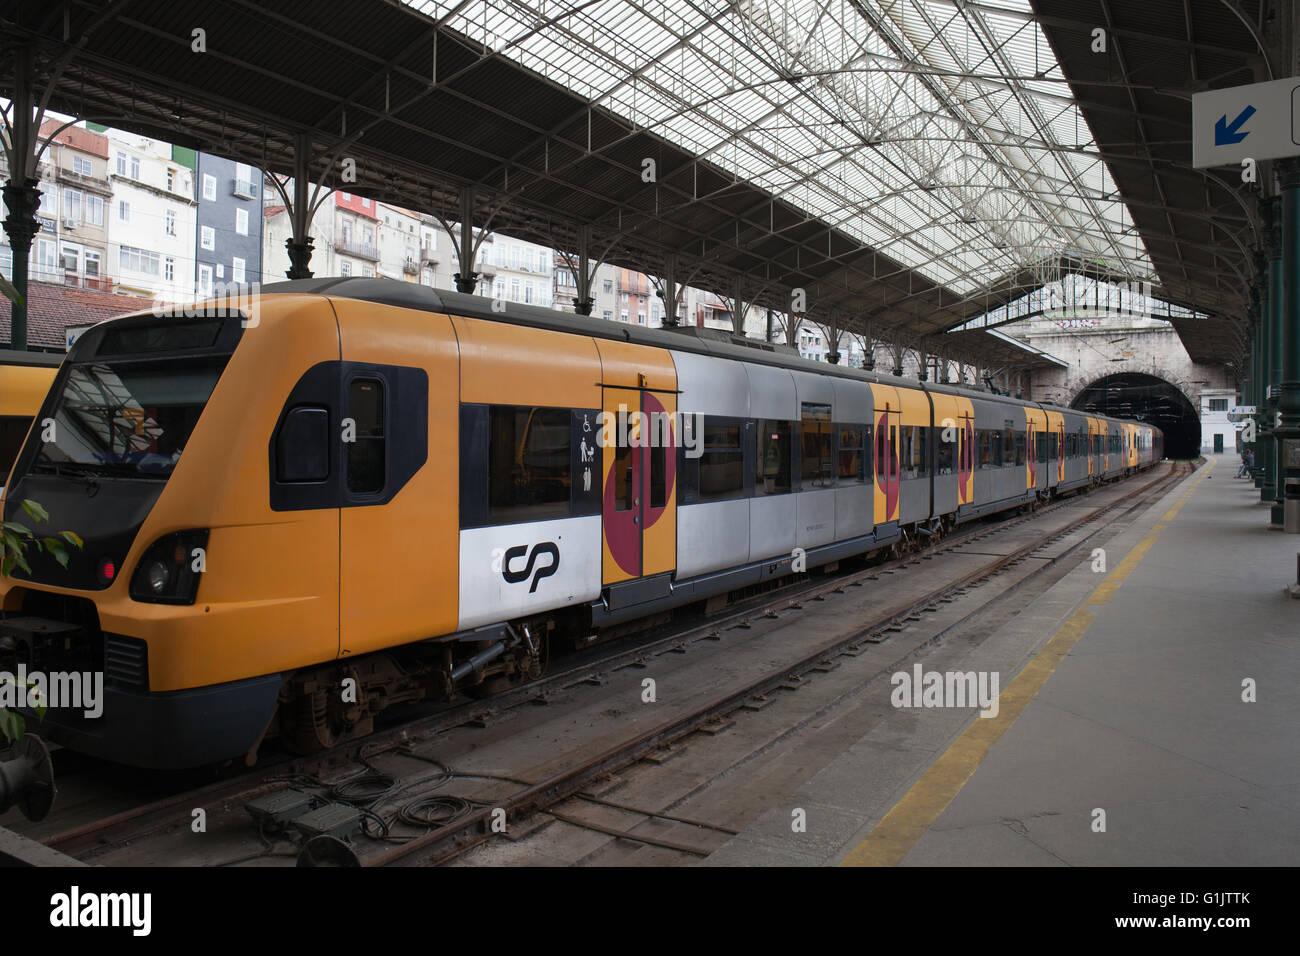 Portugal, Porto, Sao Bento Railway Station, train, platform, city landmark - Stock Image